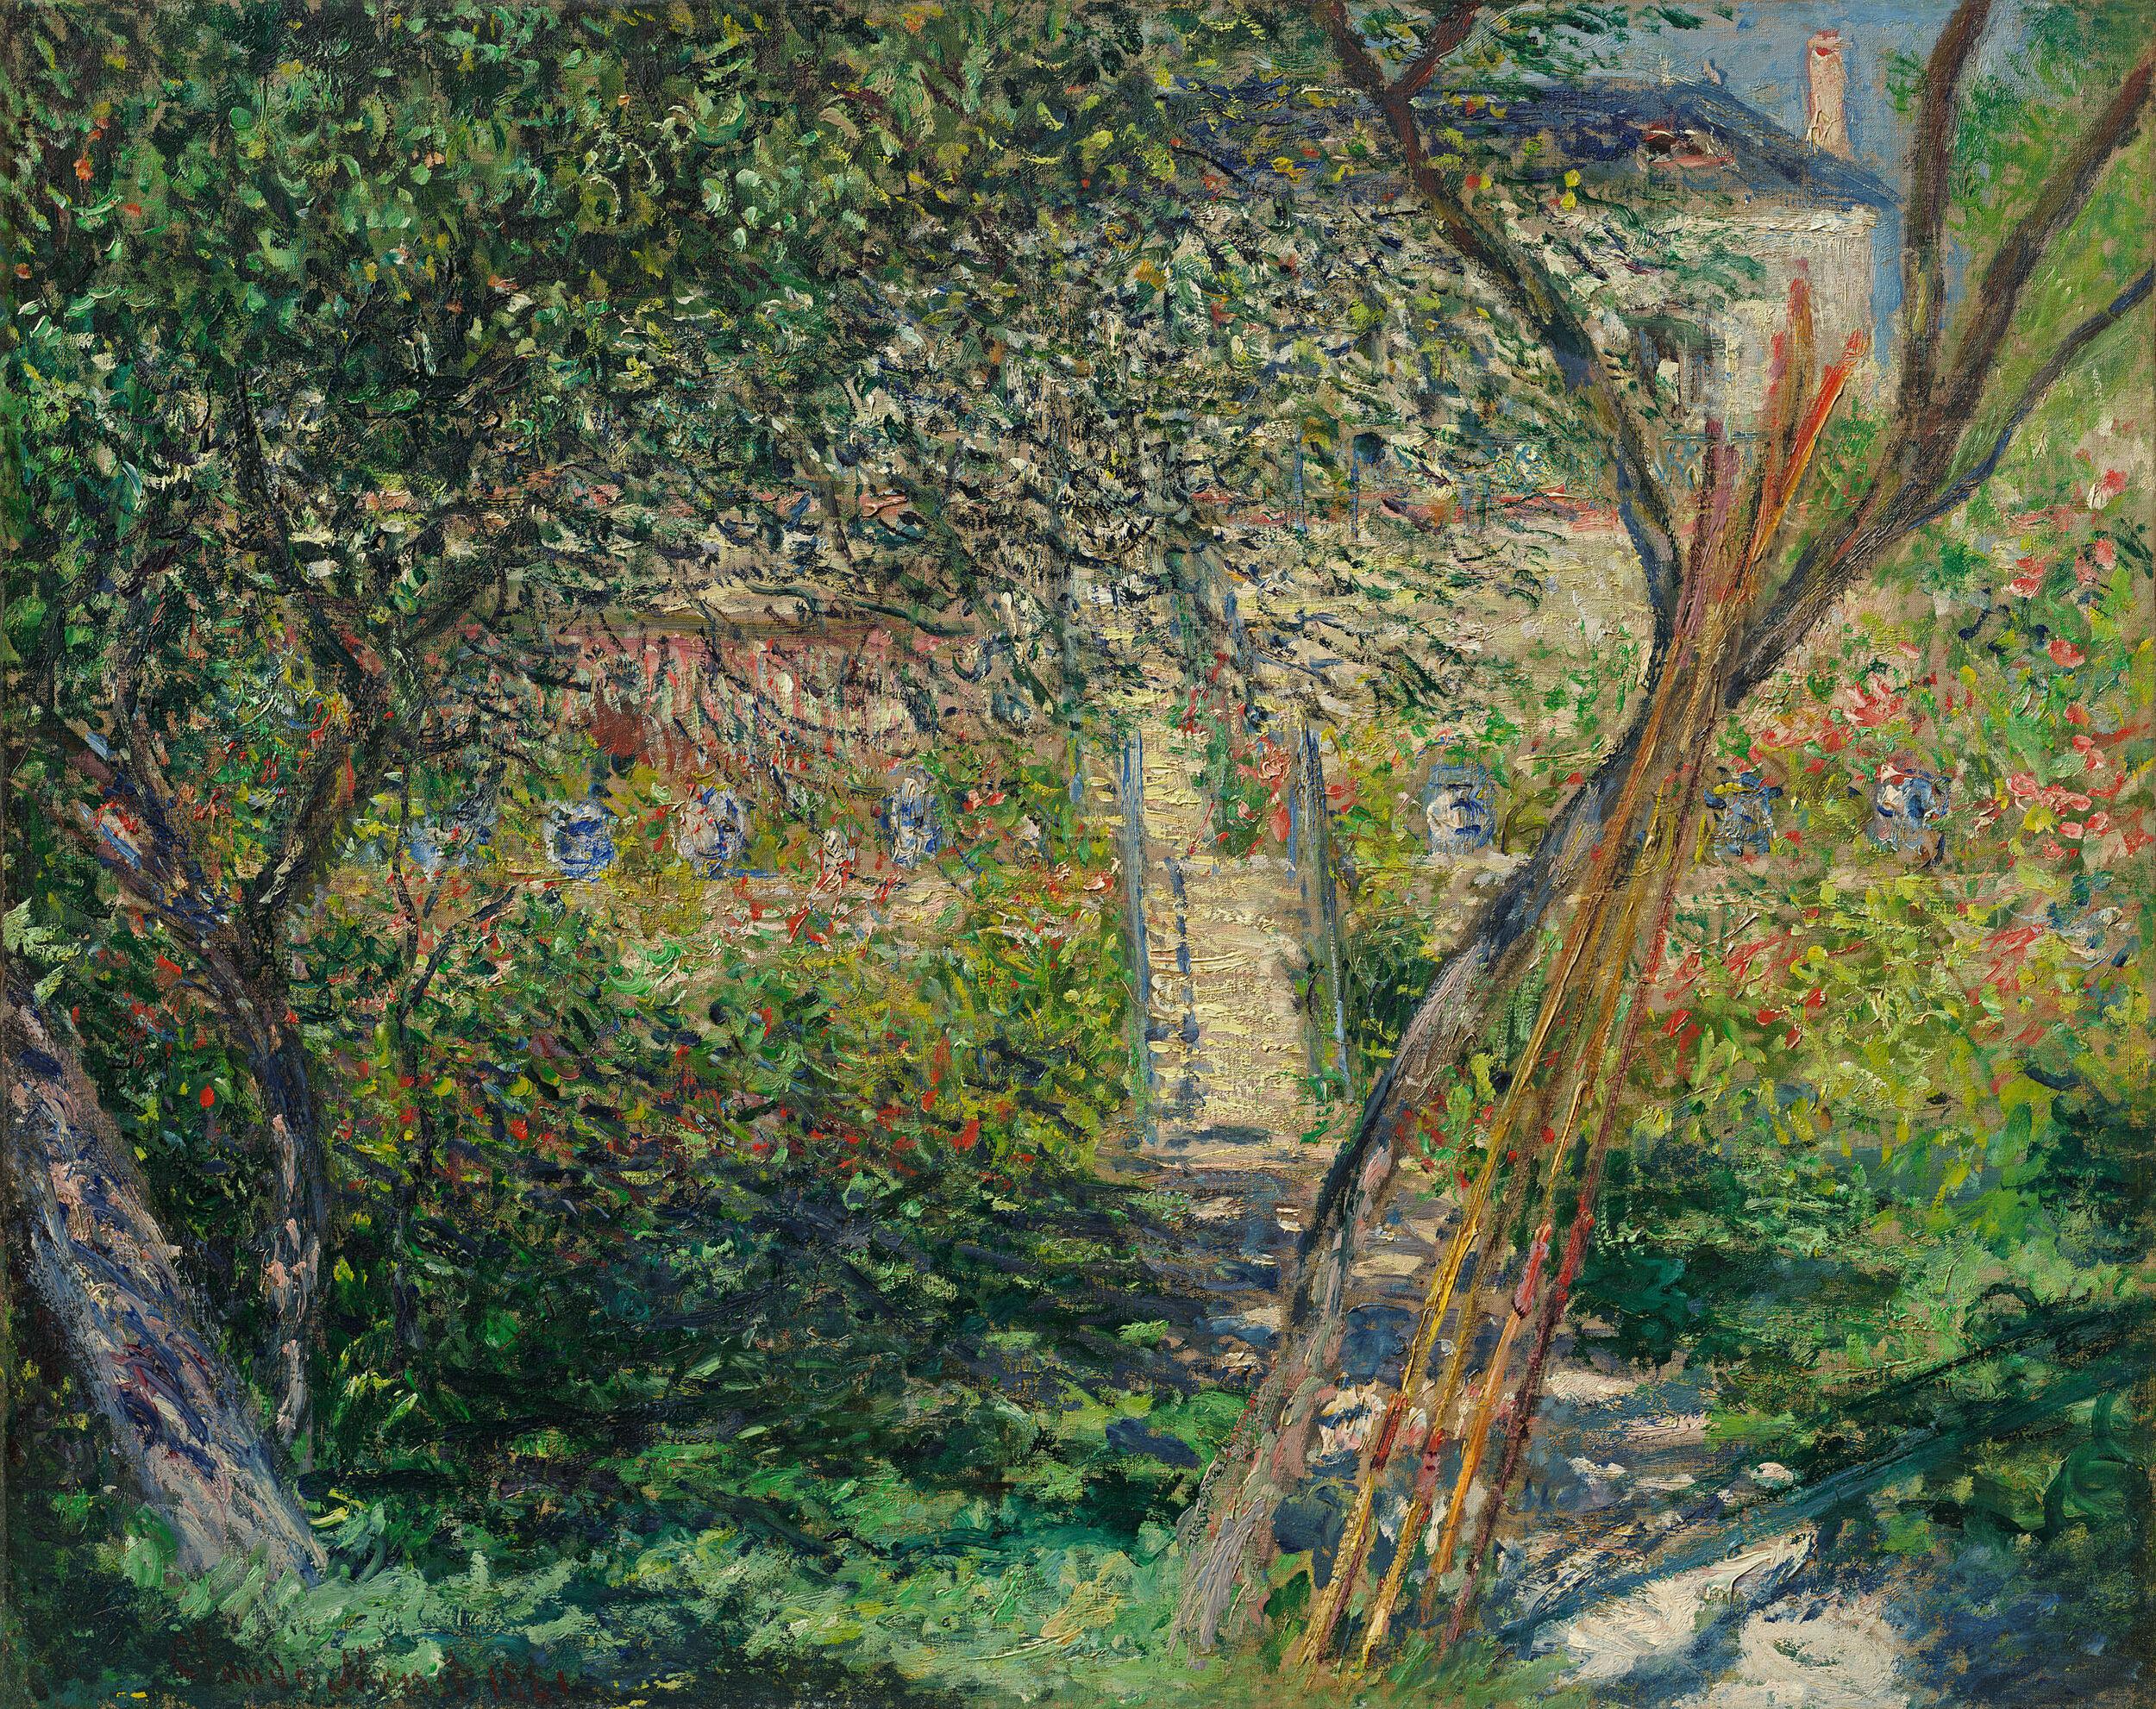 Museum Barberini | Claude Monet: The Garden at Vétheuil